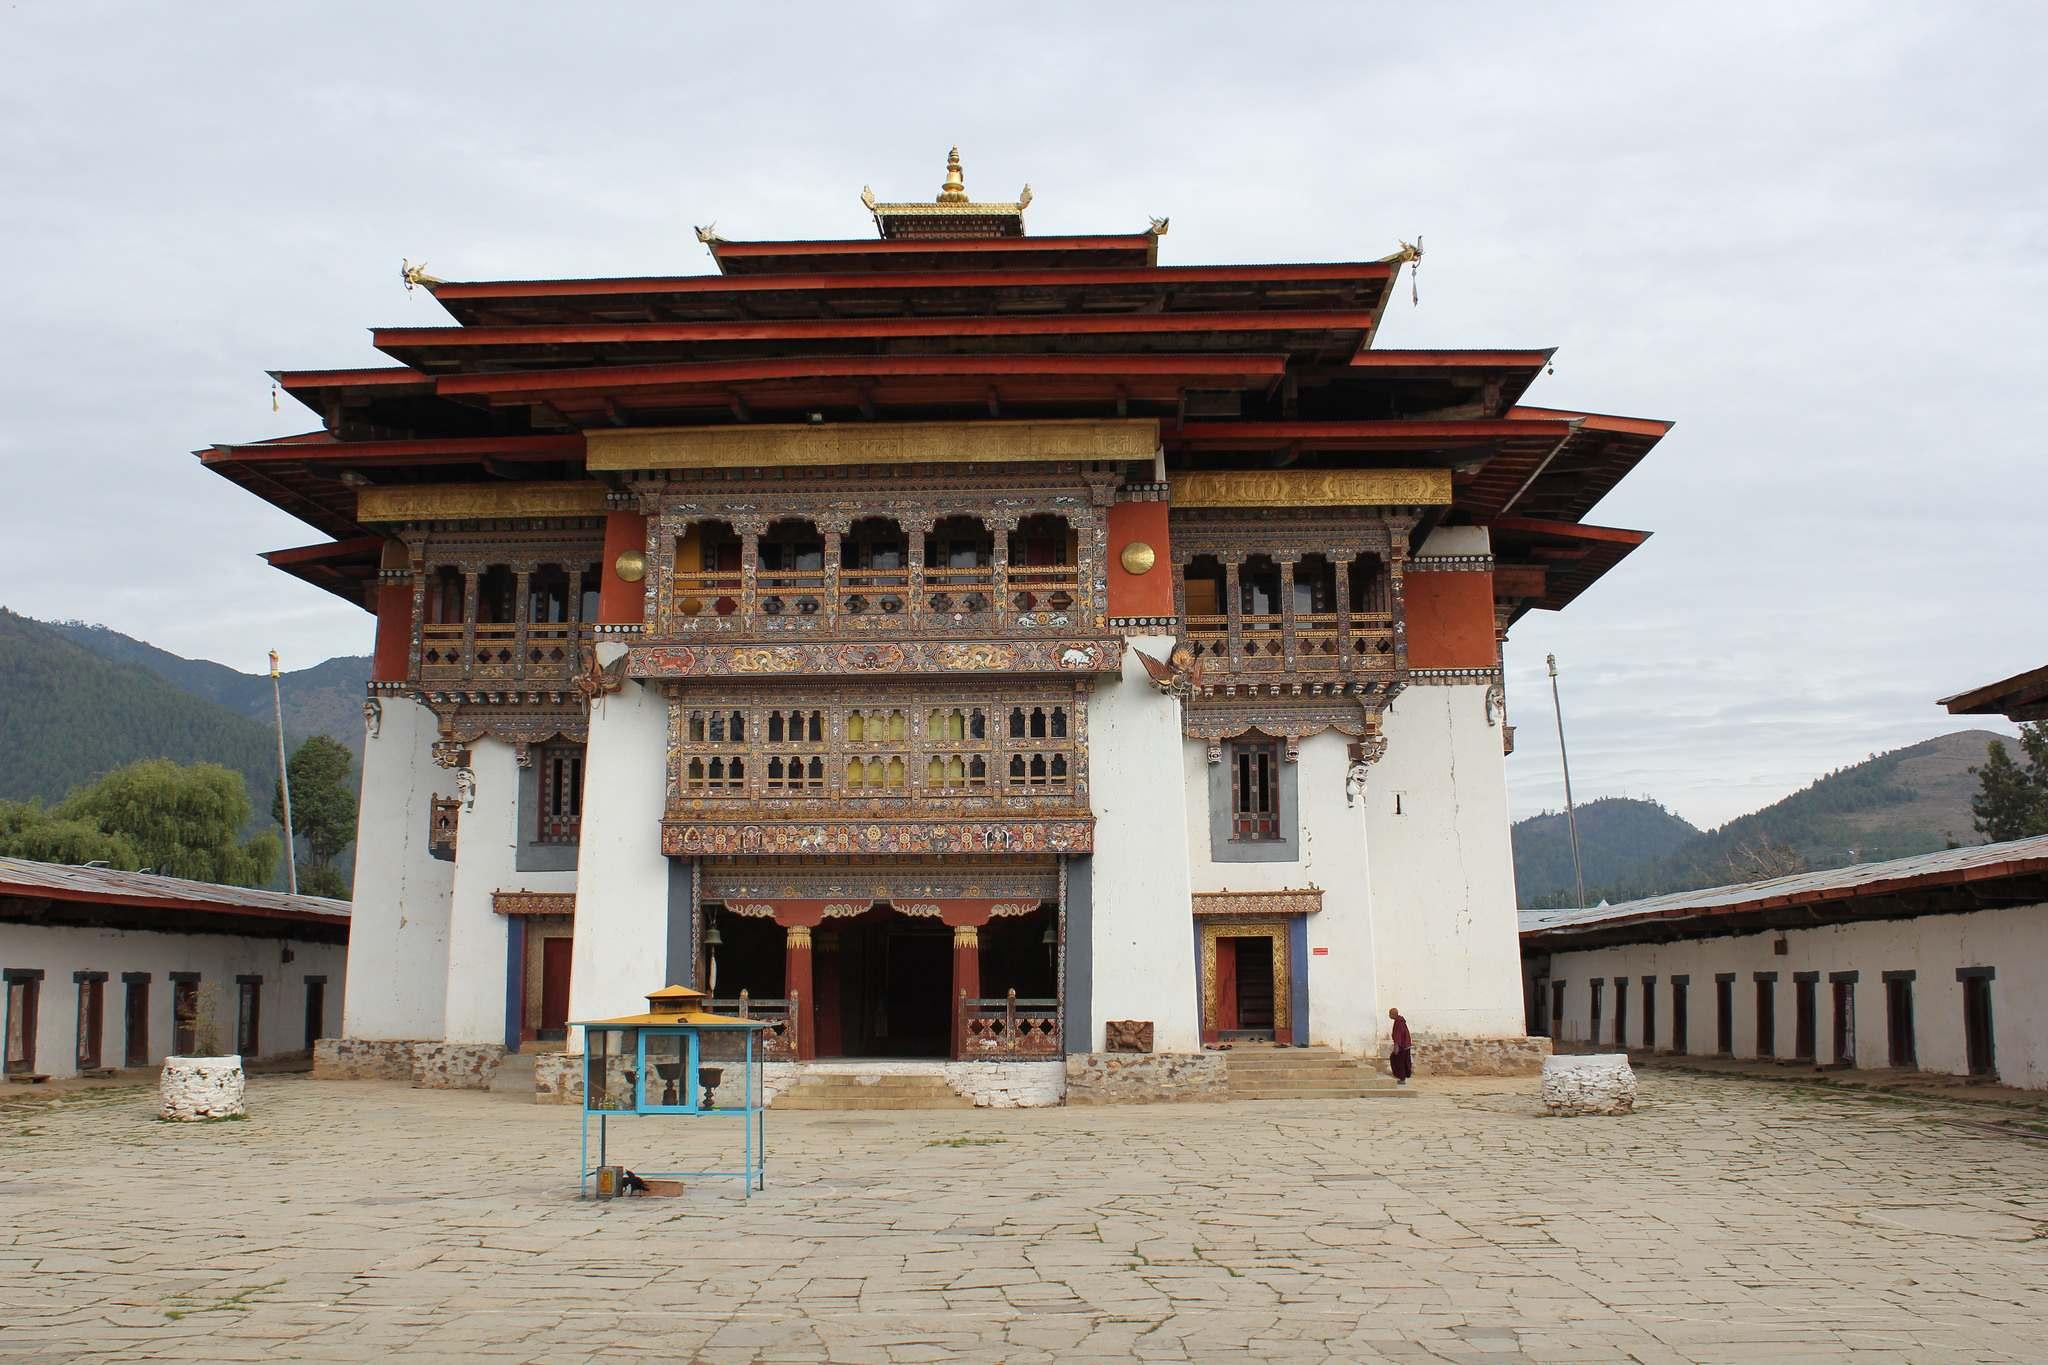 bhutan9 Bhutan   The Land of the Thunder Dragon